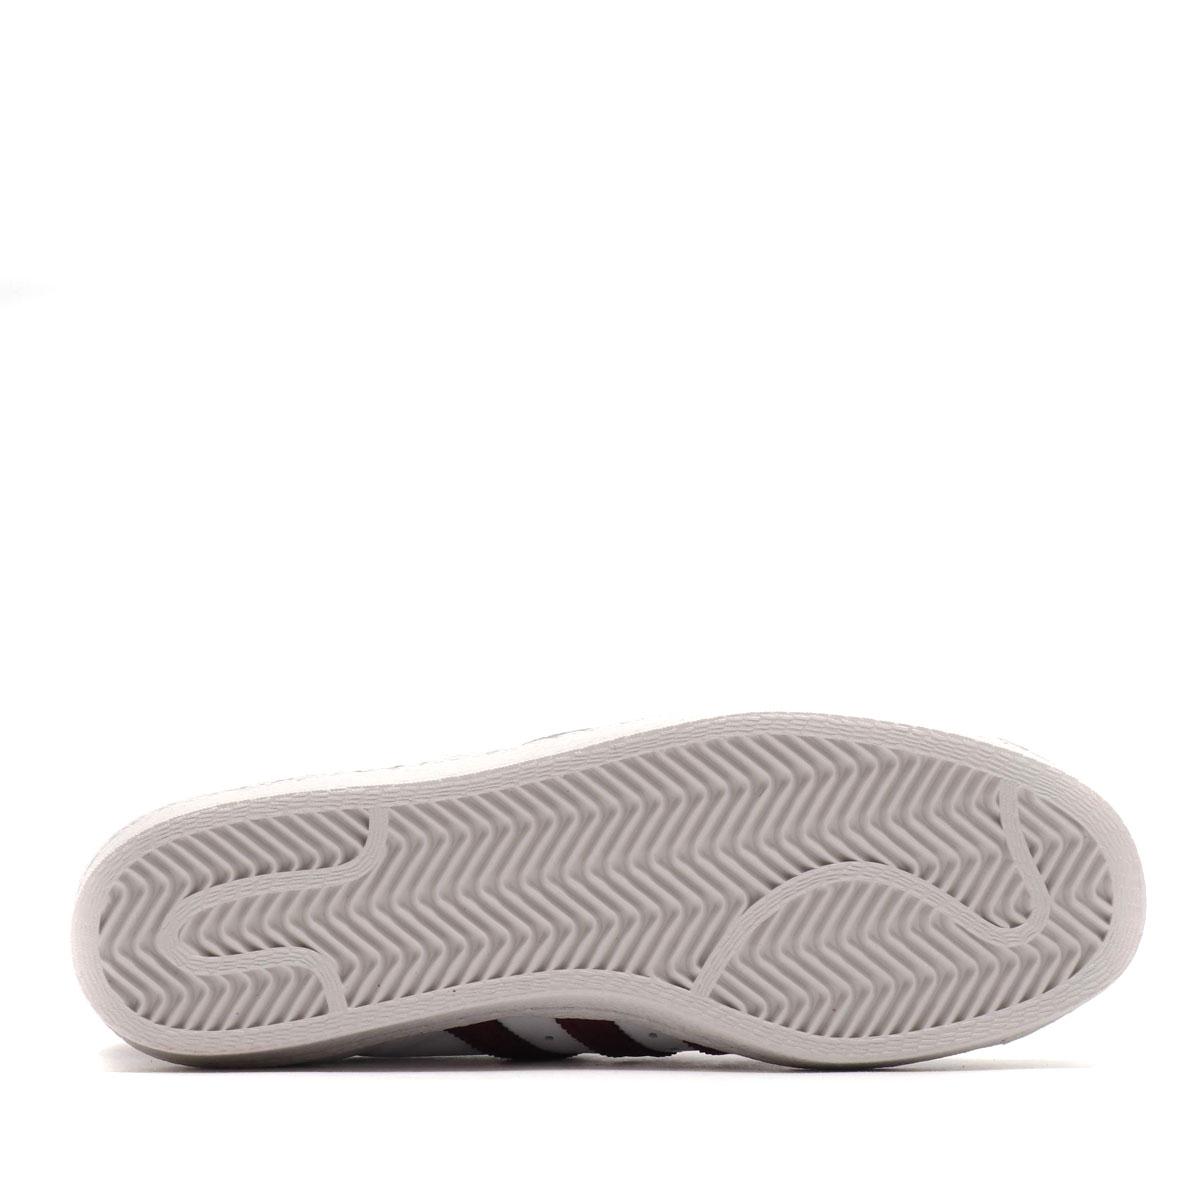 more photos 33df8 3c1d3 ... adidas Originals SUPERSTAR 80s (RUNNING WHITE MAROON CRYSTAL WHITE) (Adidas  original ...